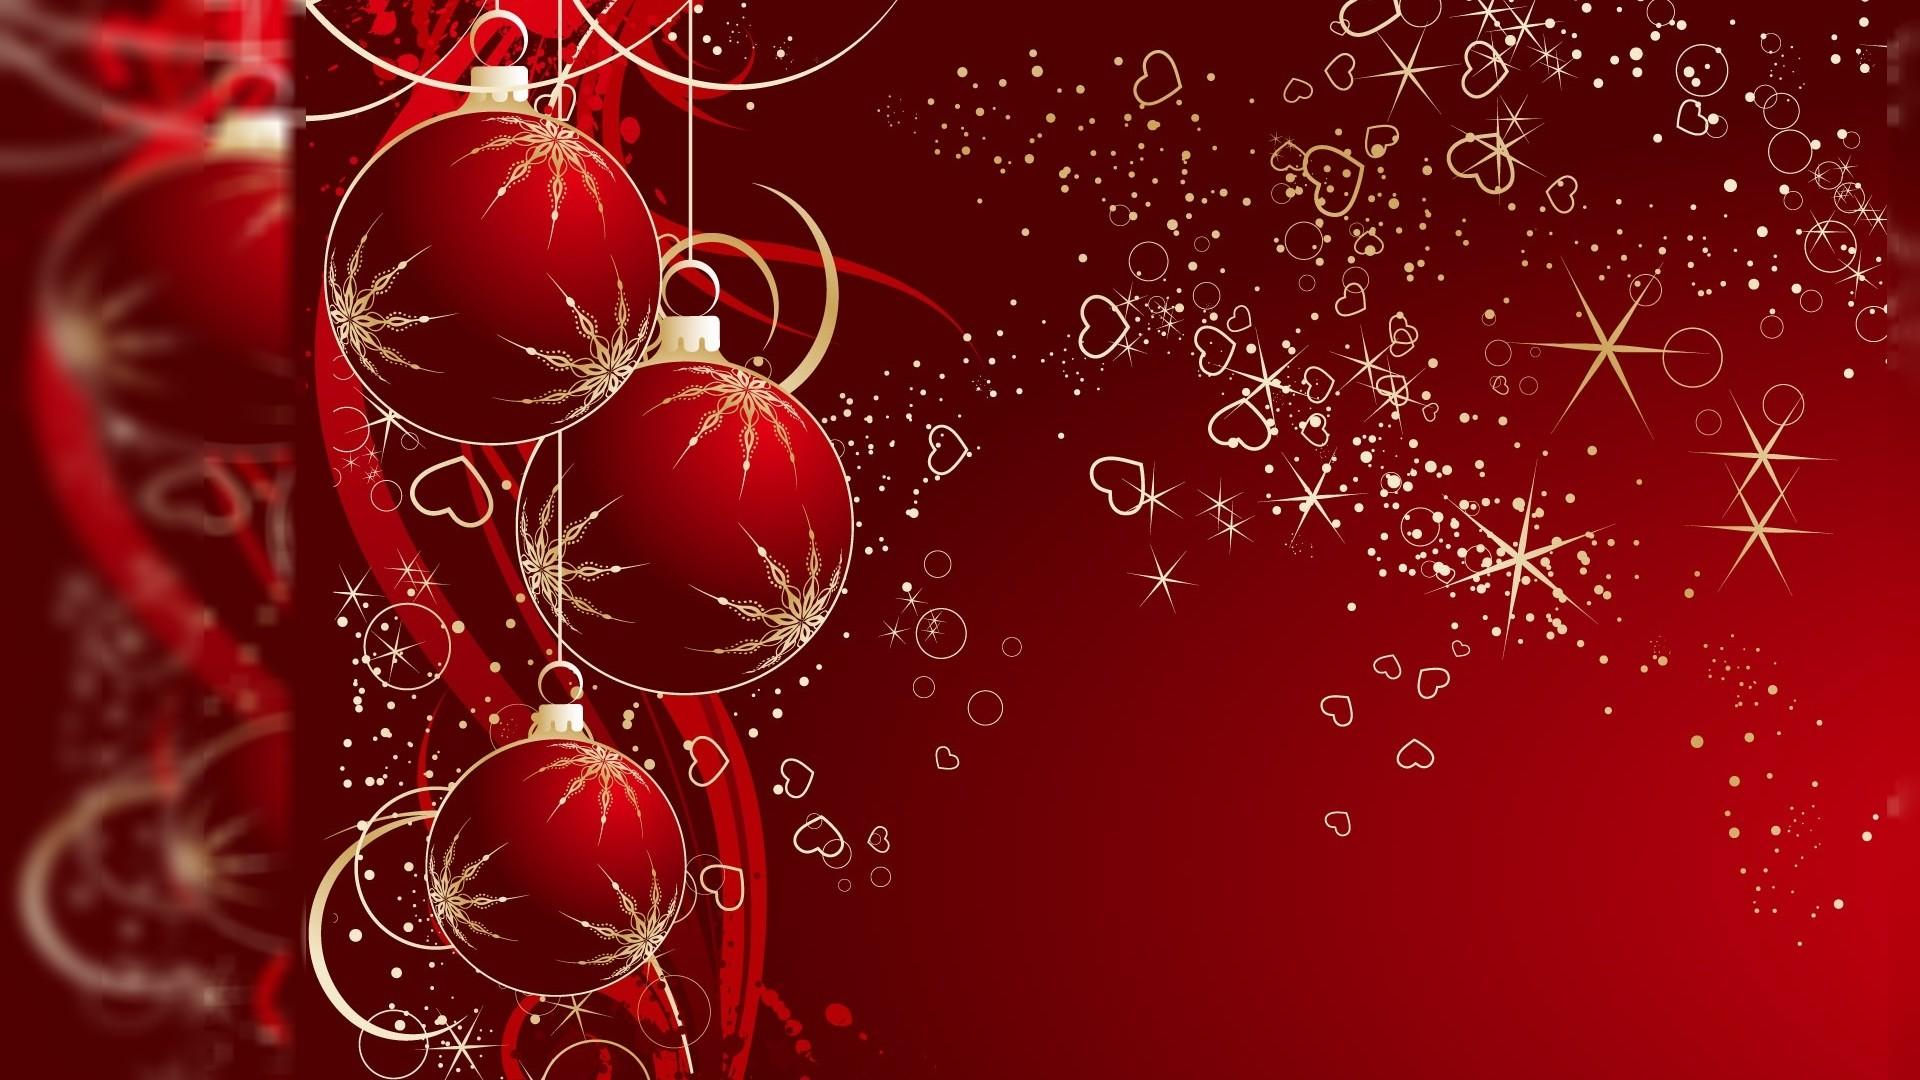 Christmas Wallpaper Hd wallpaper – 736525